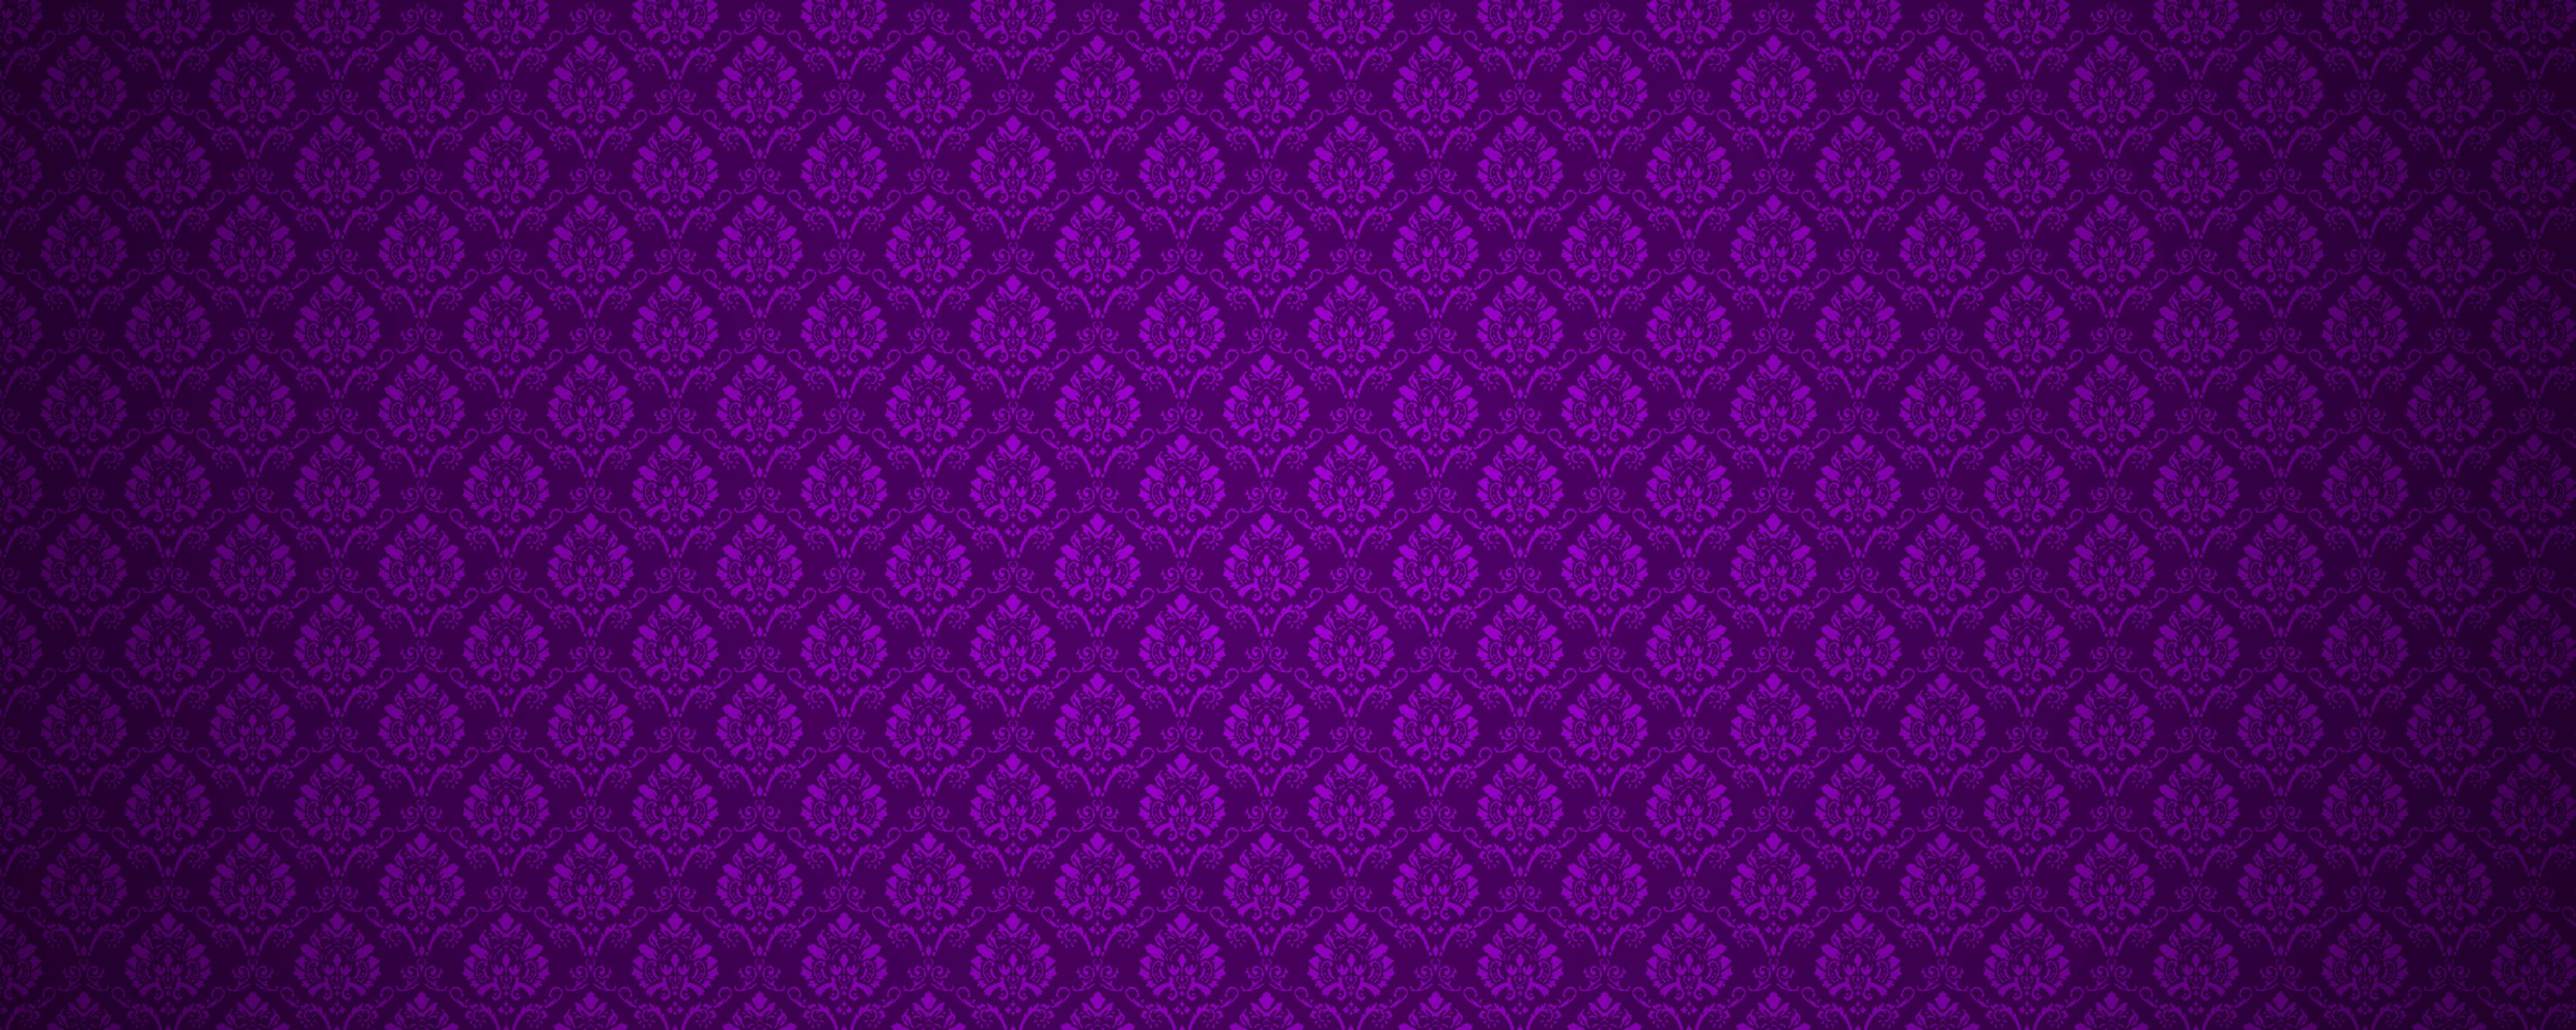 Purple Patterns 50002000 Wallpaper 853682 5000x2000